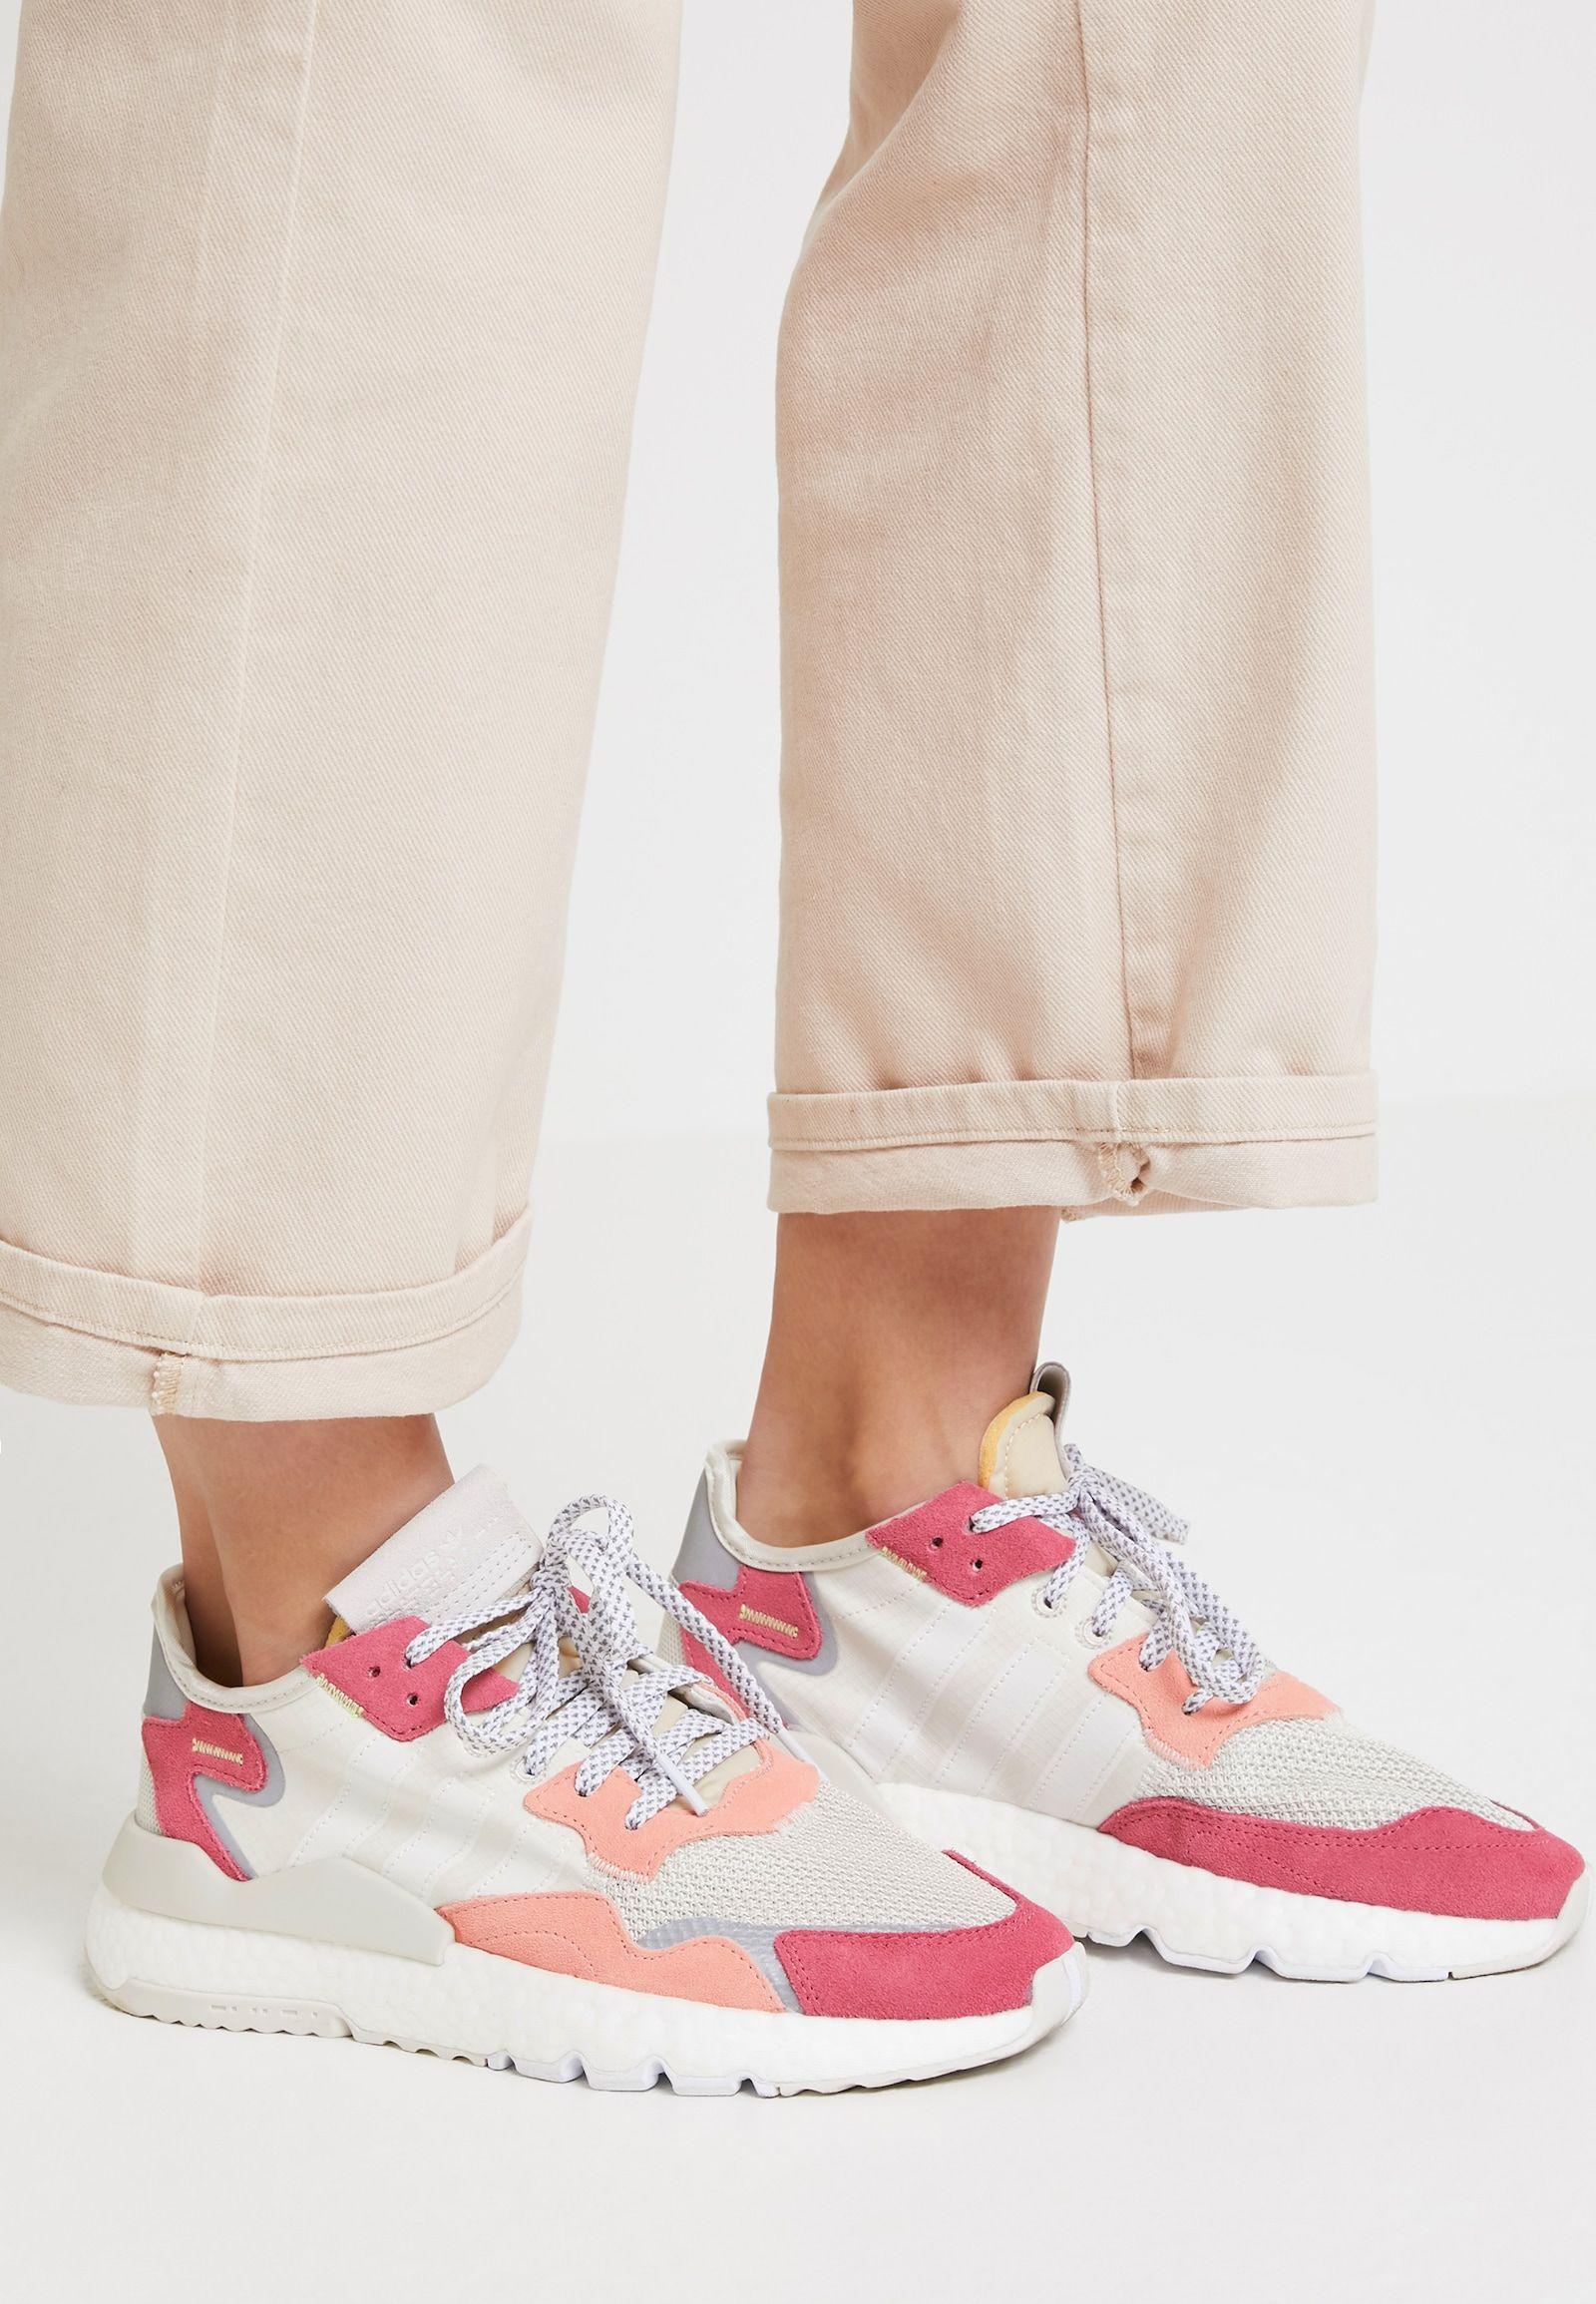 Adidas Originals Nite Jogger Baskets Basses Raw White Optic White Trace Pink Zalando Ch Adidas Sneaker Adidas Originals Sneaker Schuhe Ohne Schnursenkel